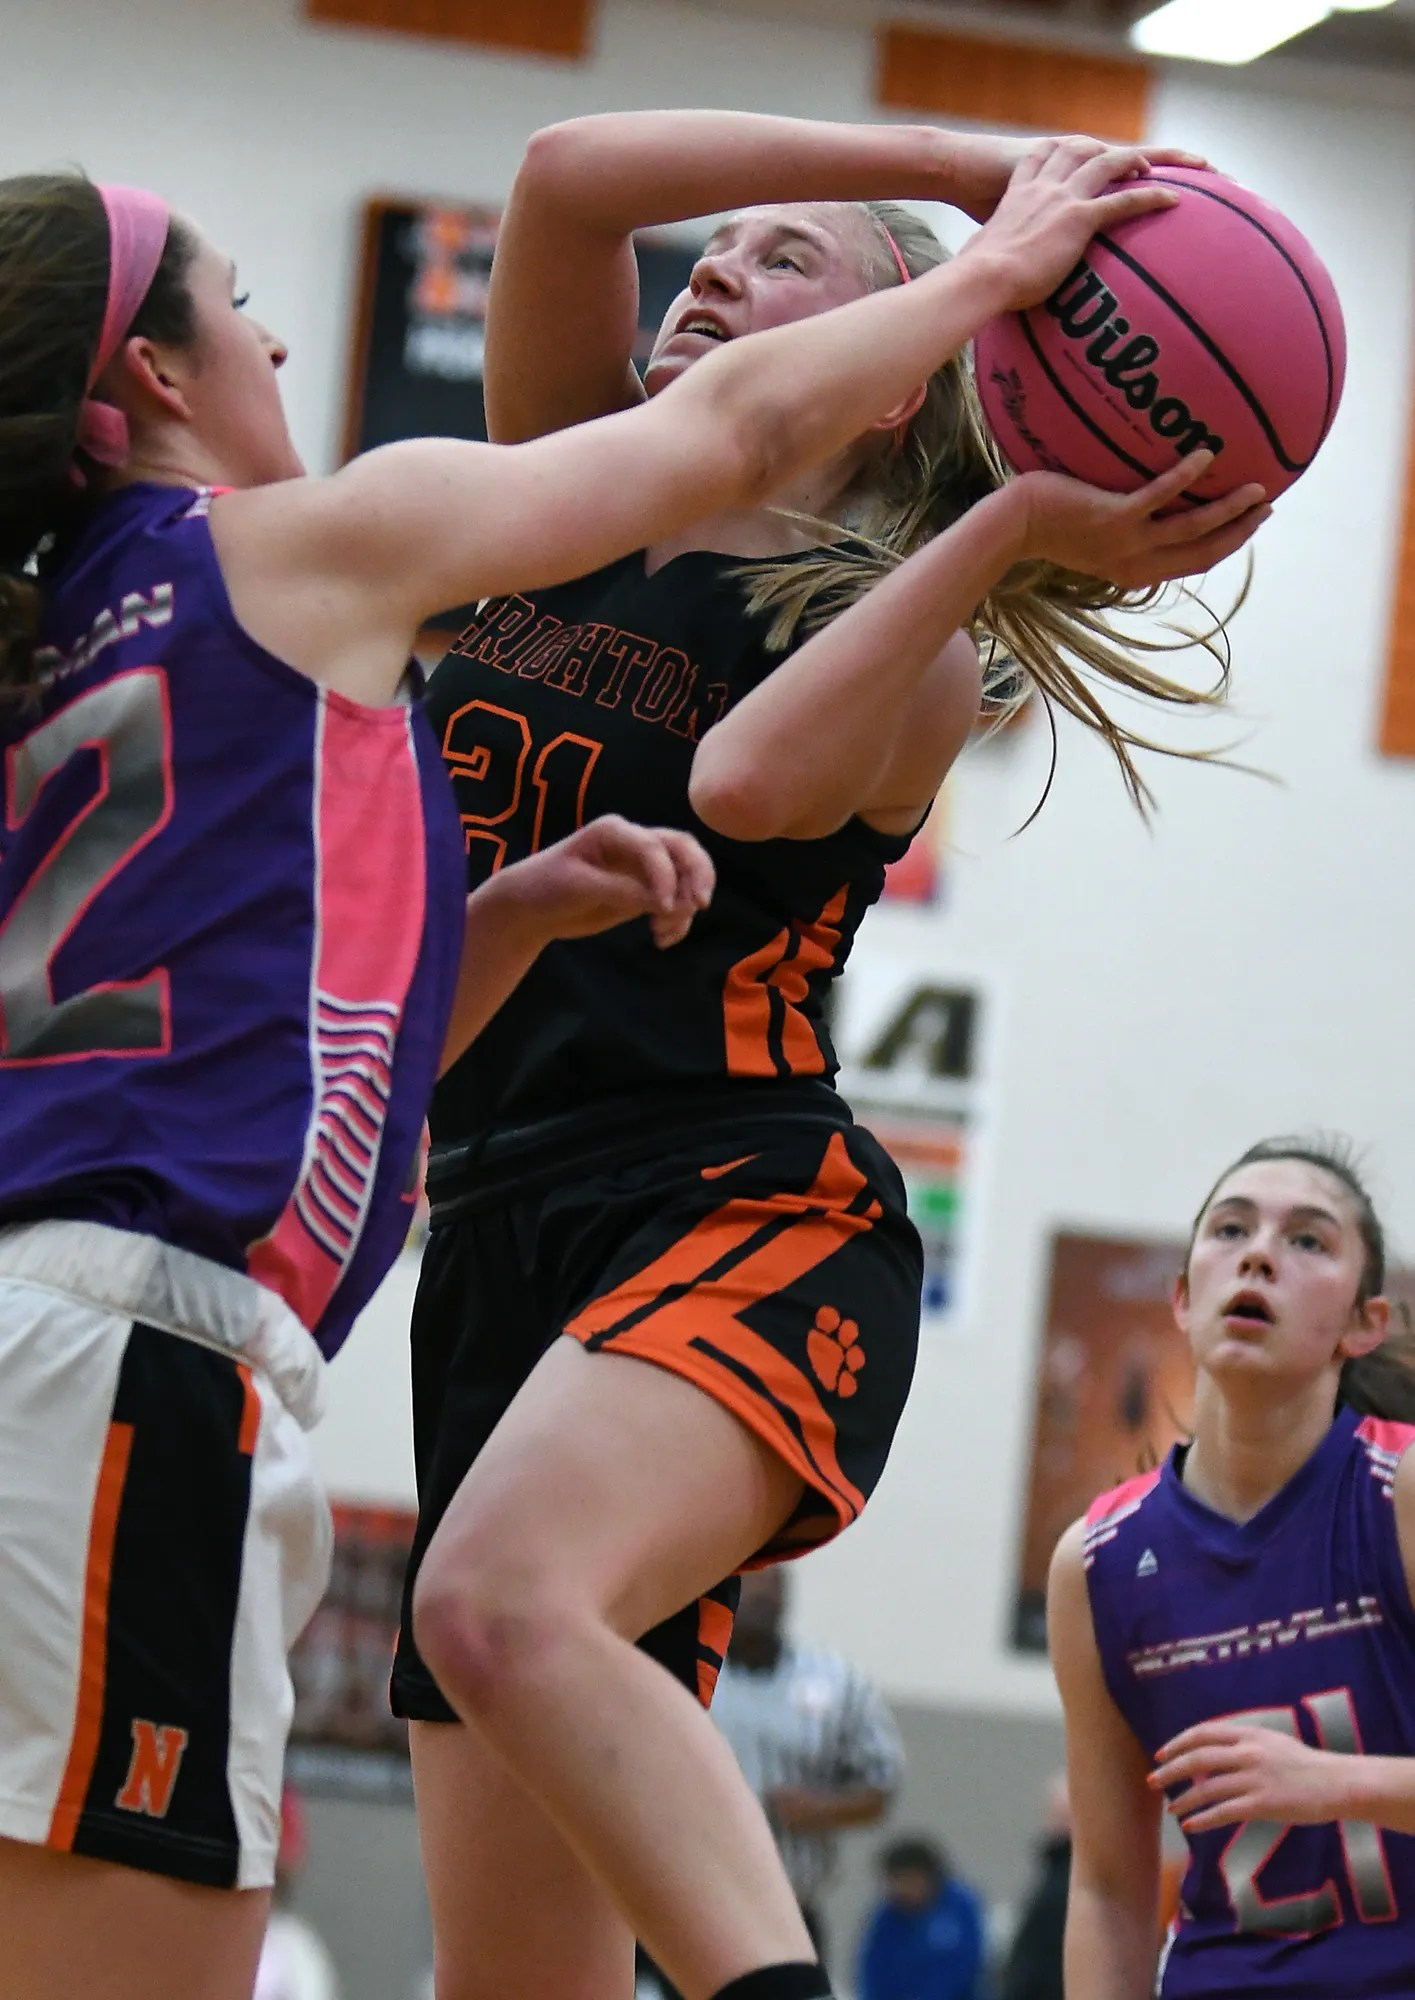 David Goricki S Girls High School Basketball Rankings Feb 2